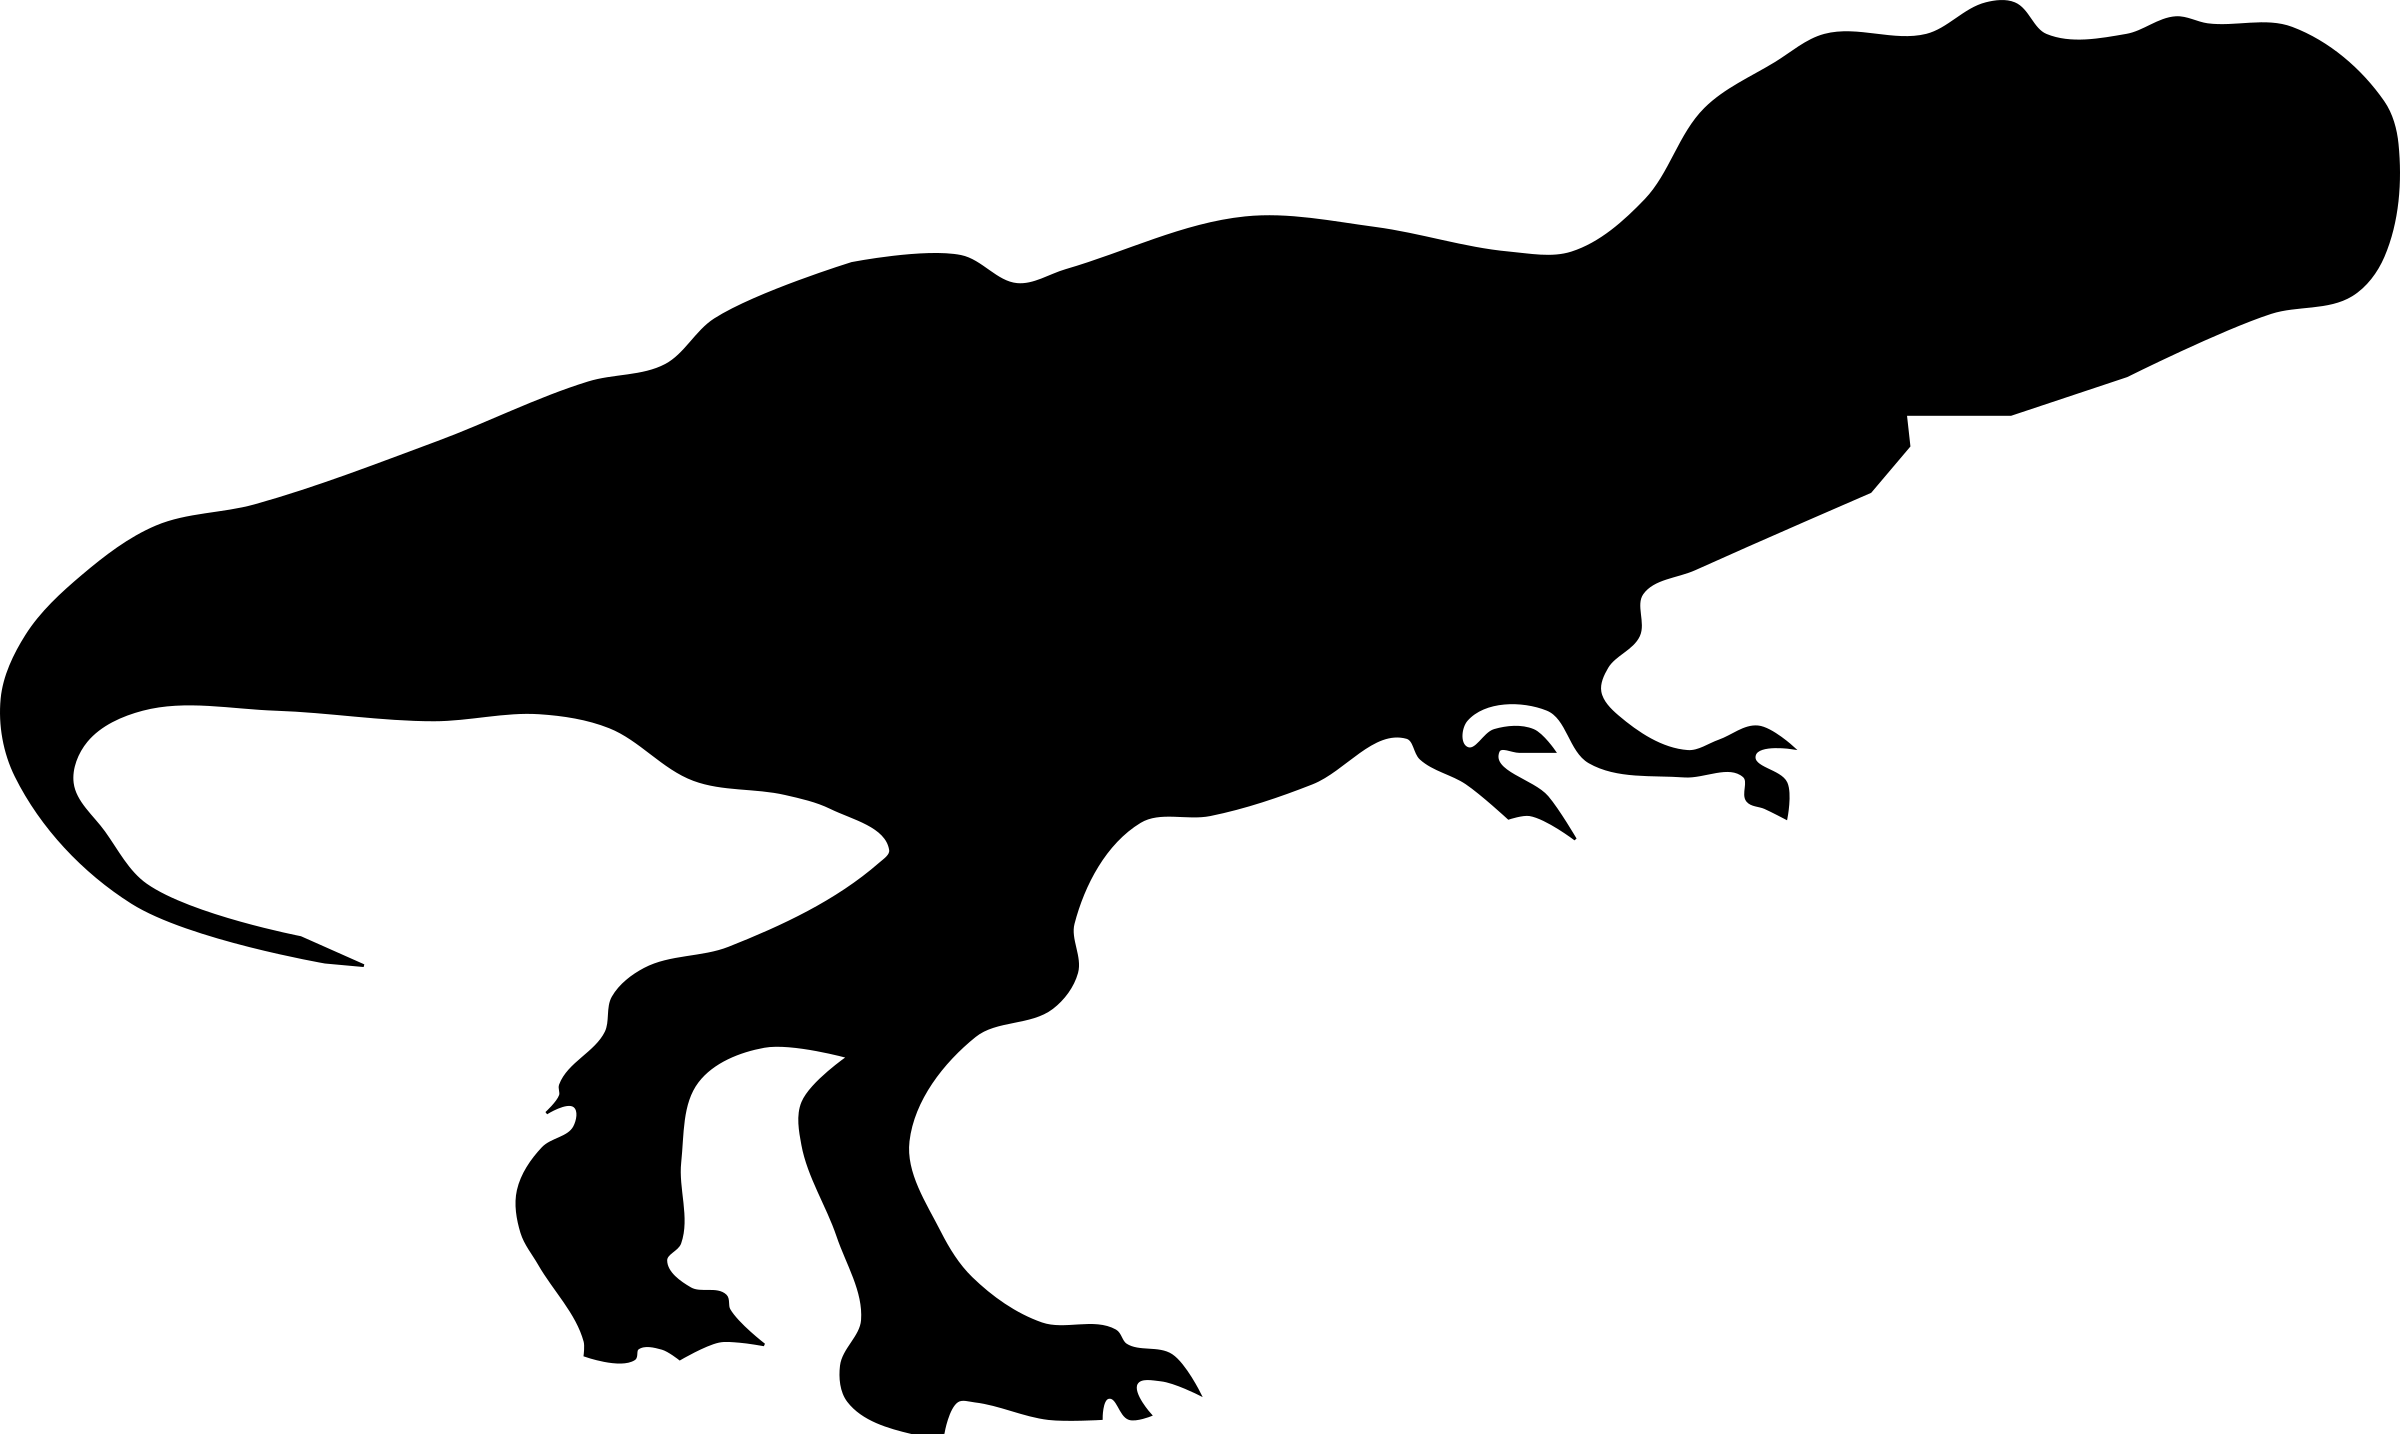 Free T Rex Silhouette Clip Art, Download Free Clip Art, Free.